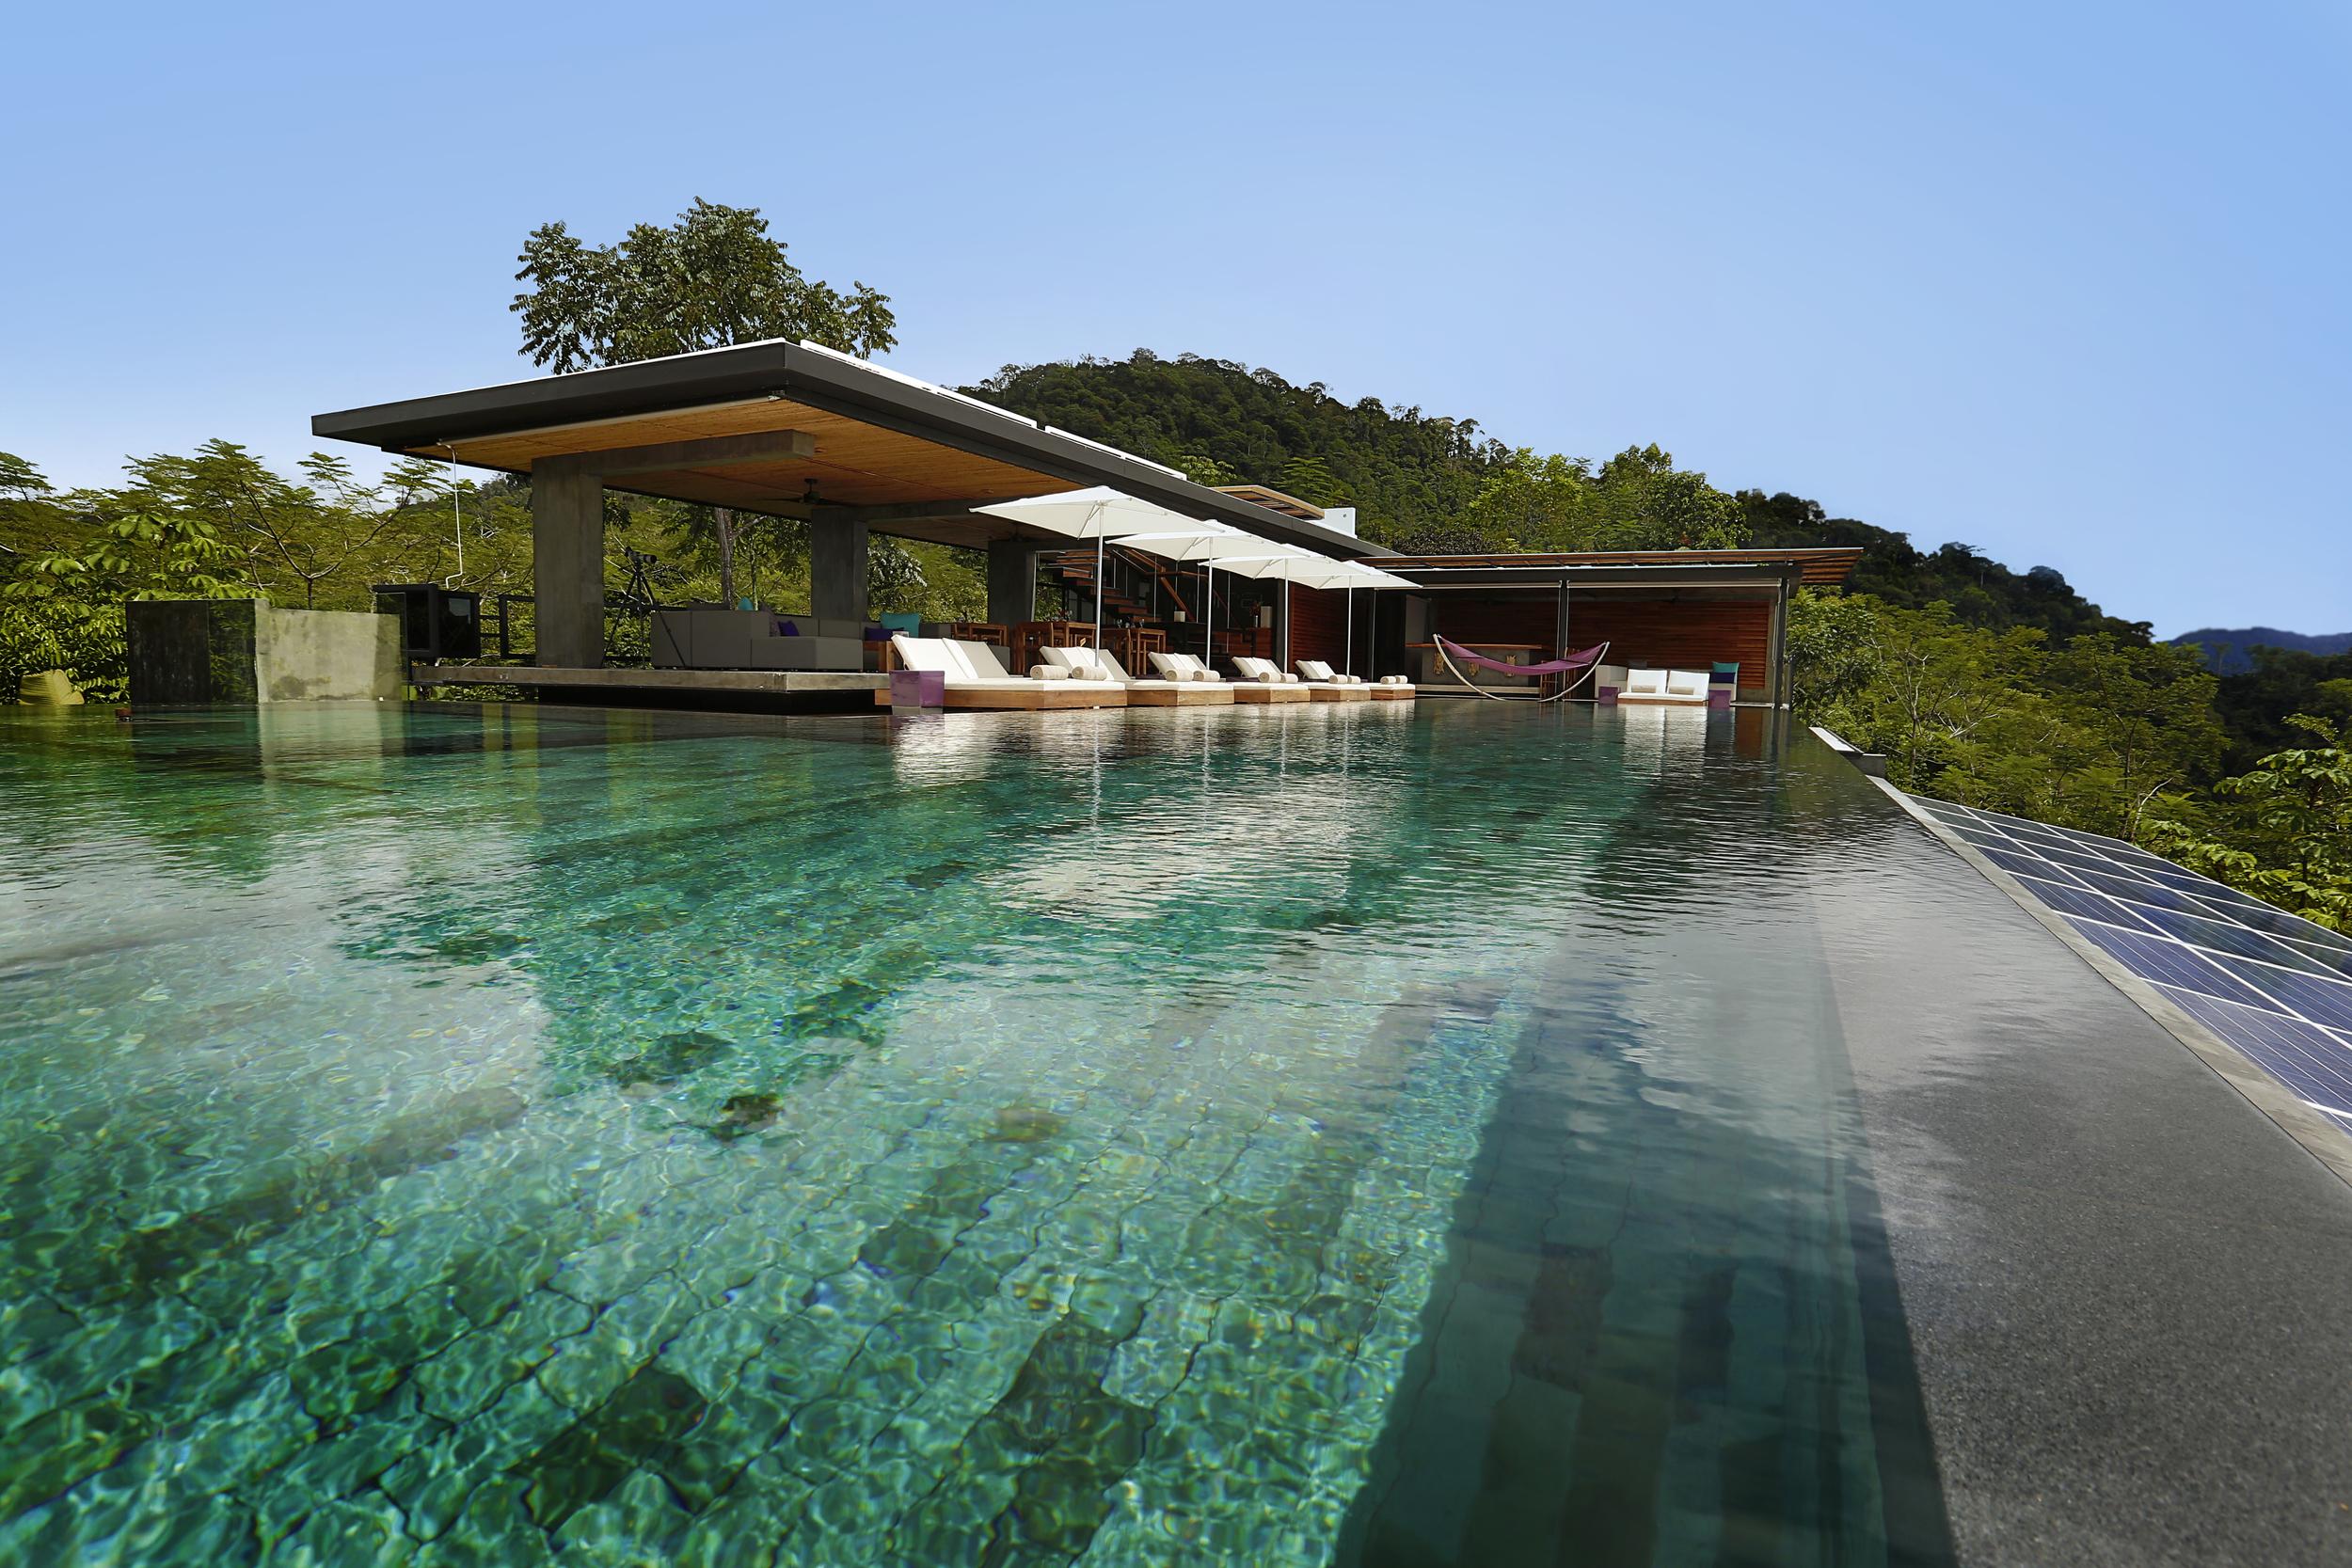 Image property of Kura Design Villas